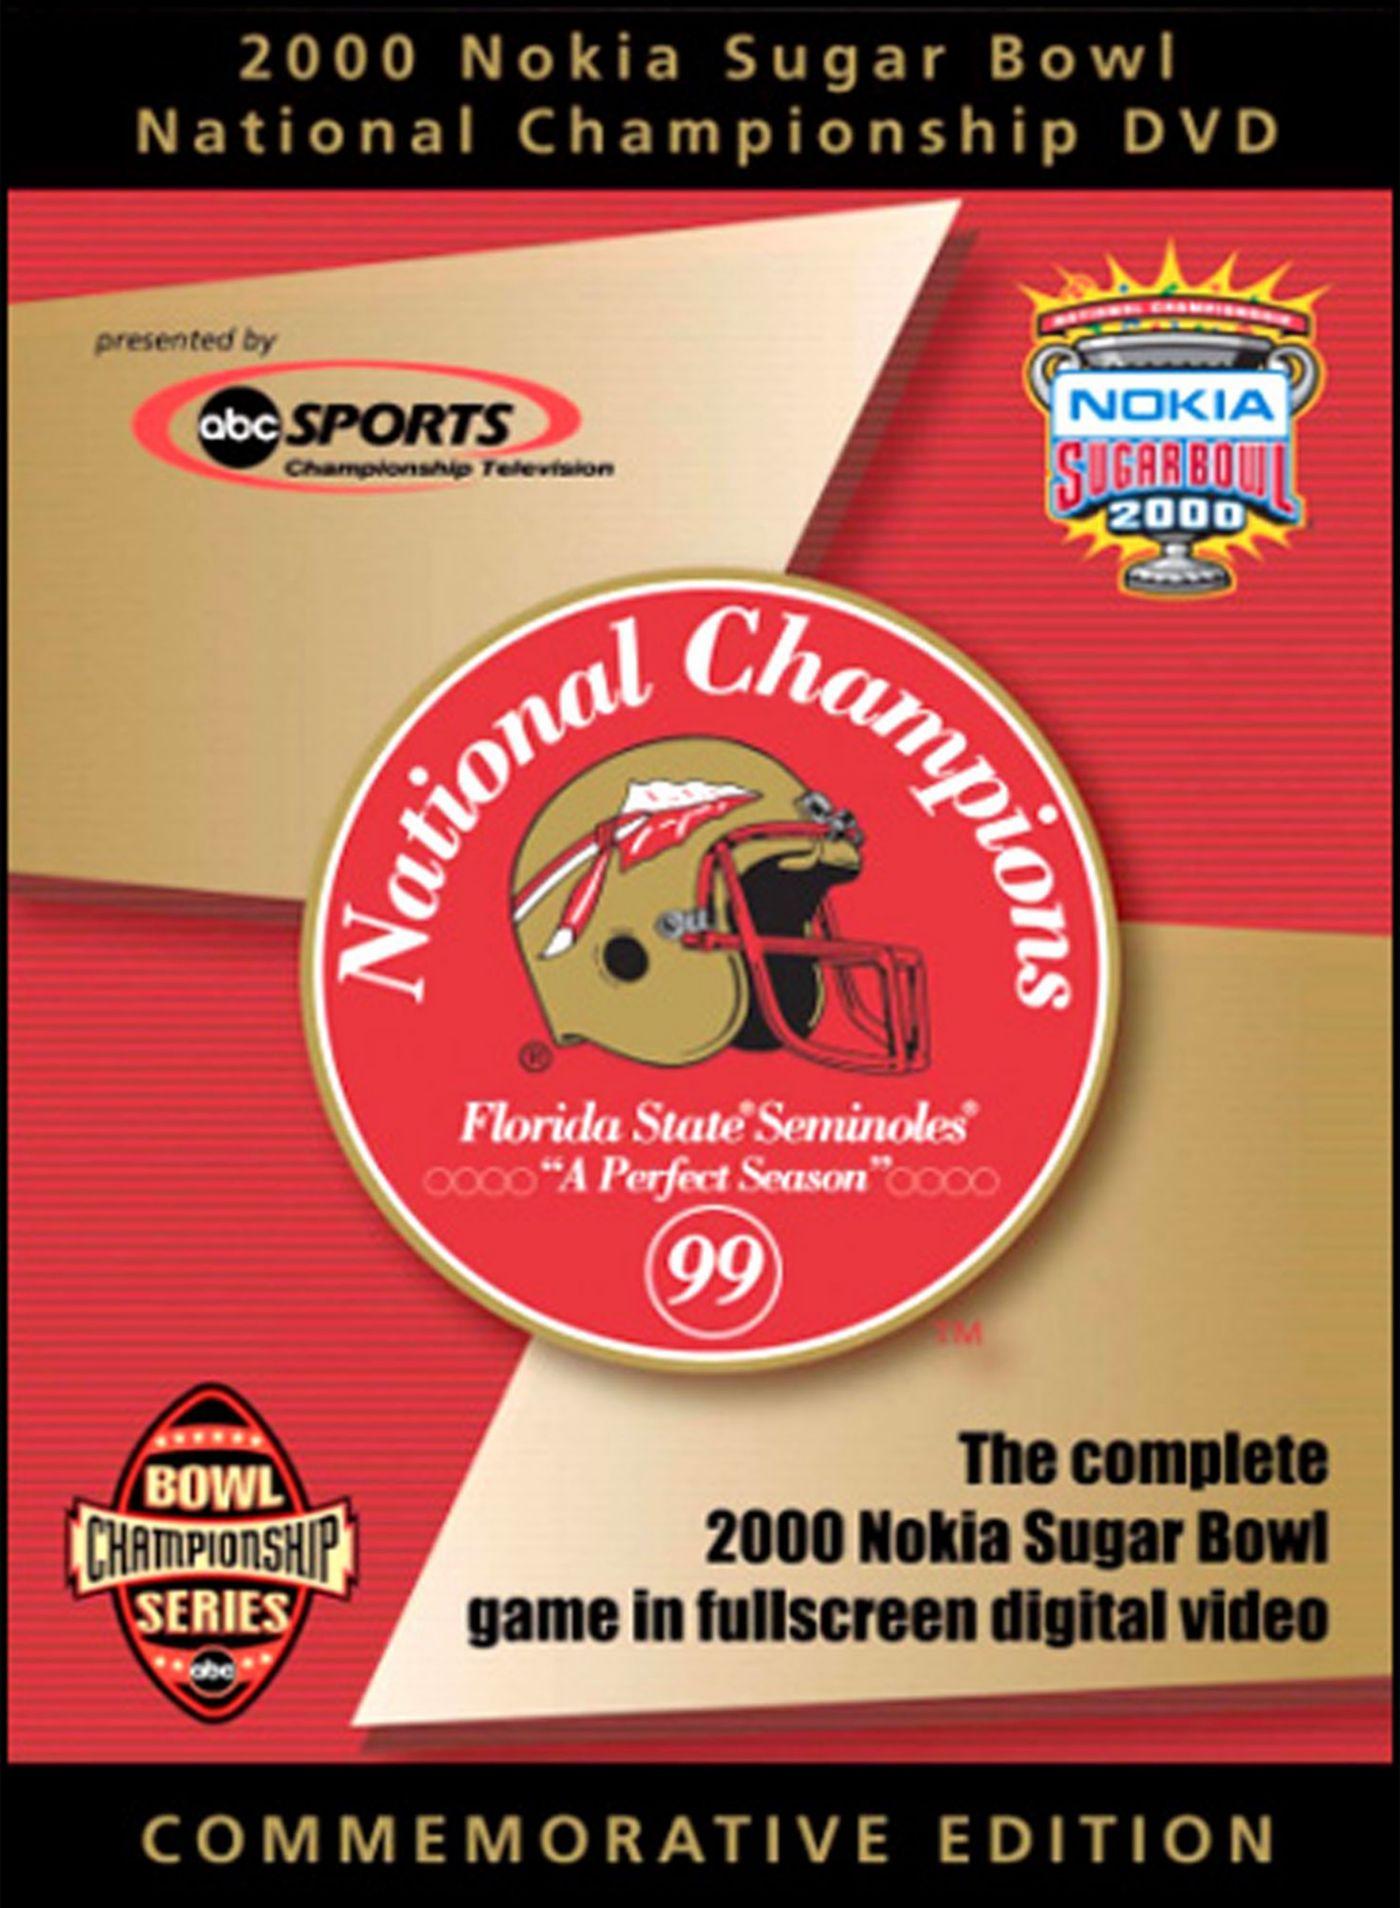 2000 Nokia Sugar Bowl Game: Florida State Seminoles vs. Virginia Tech Hokies DVD